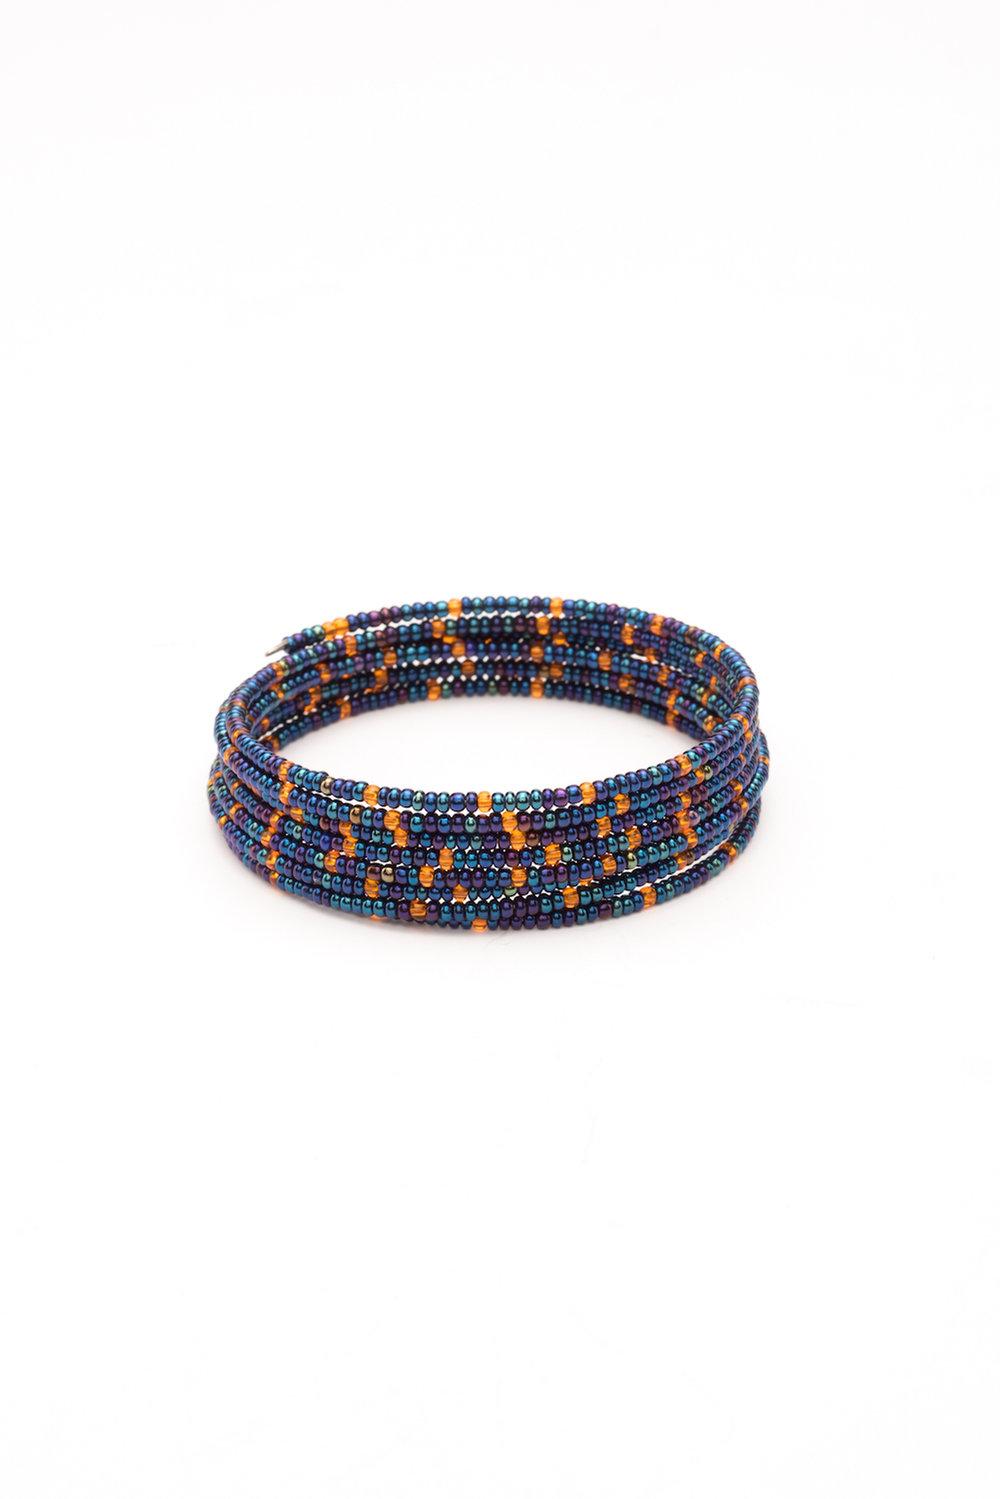 Slinky Bracelet Sterling Cont-BW3001 (2).jpg